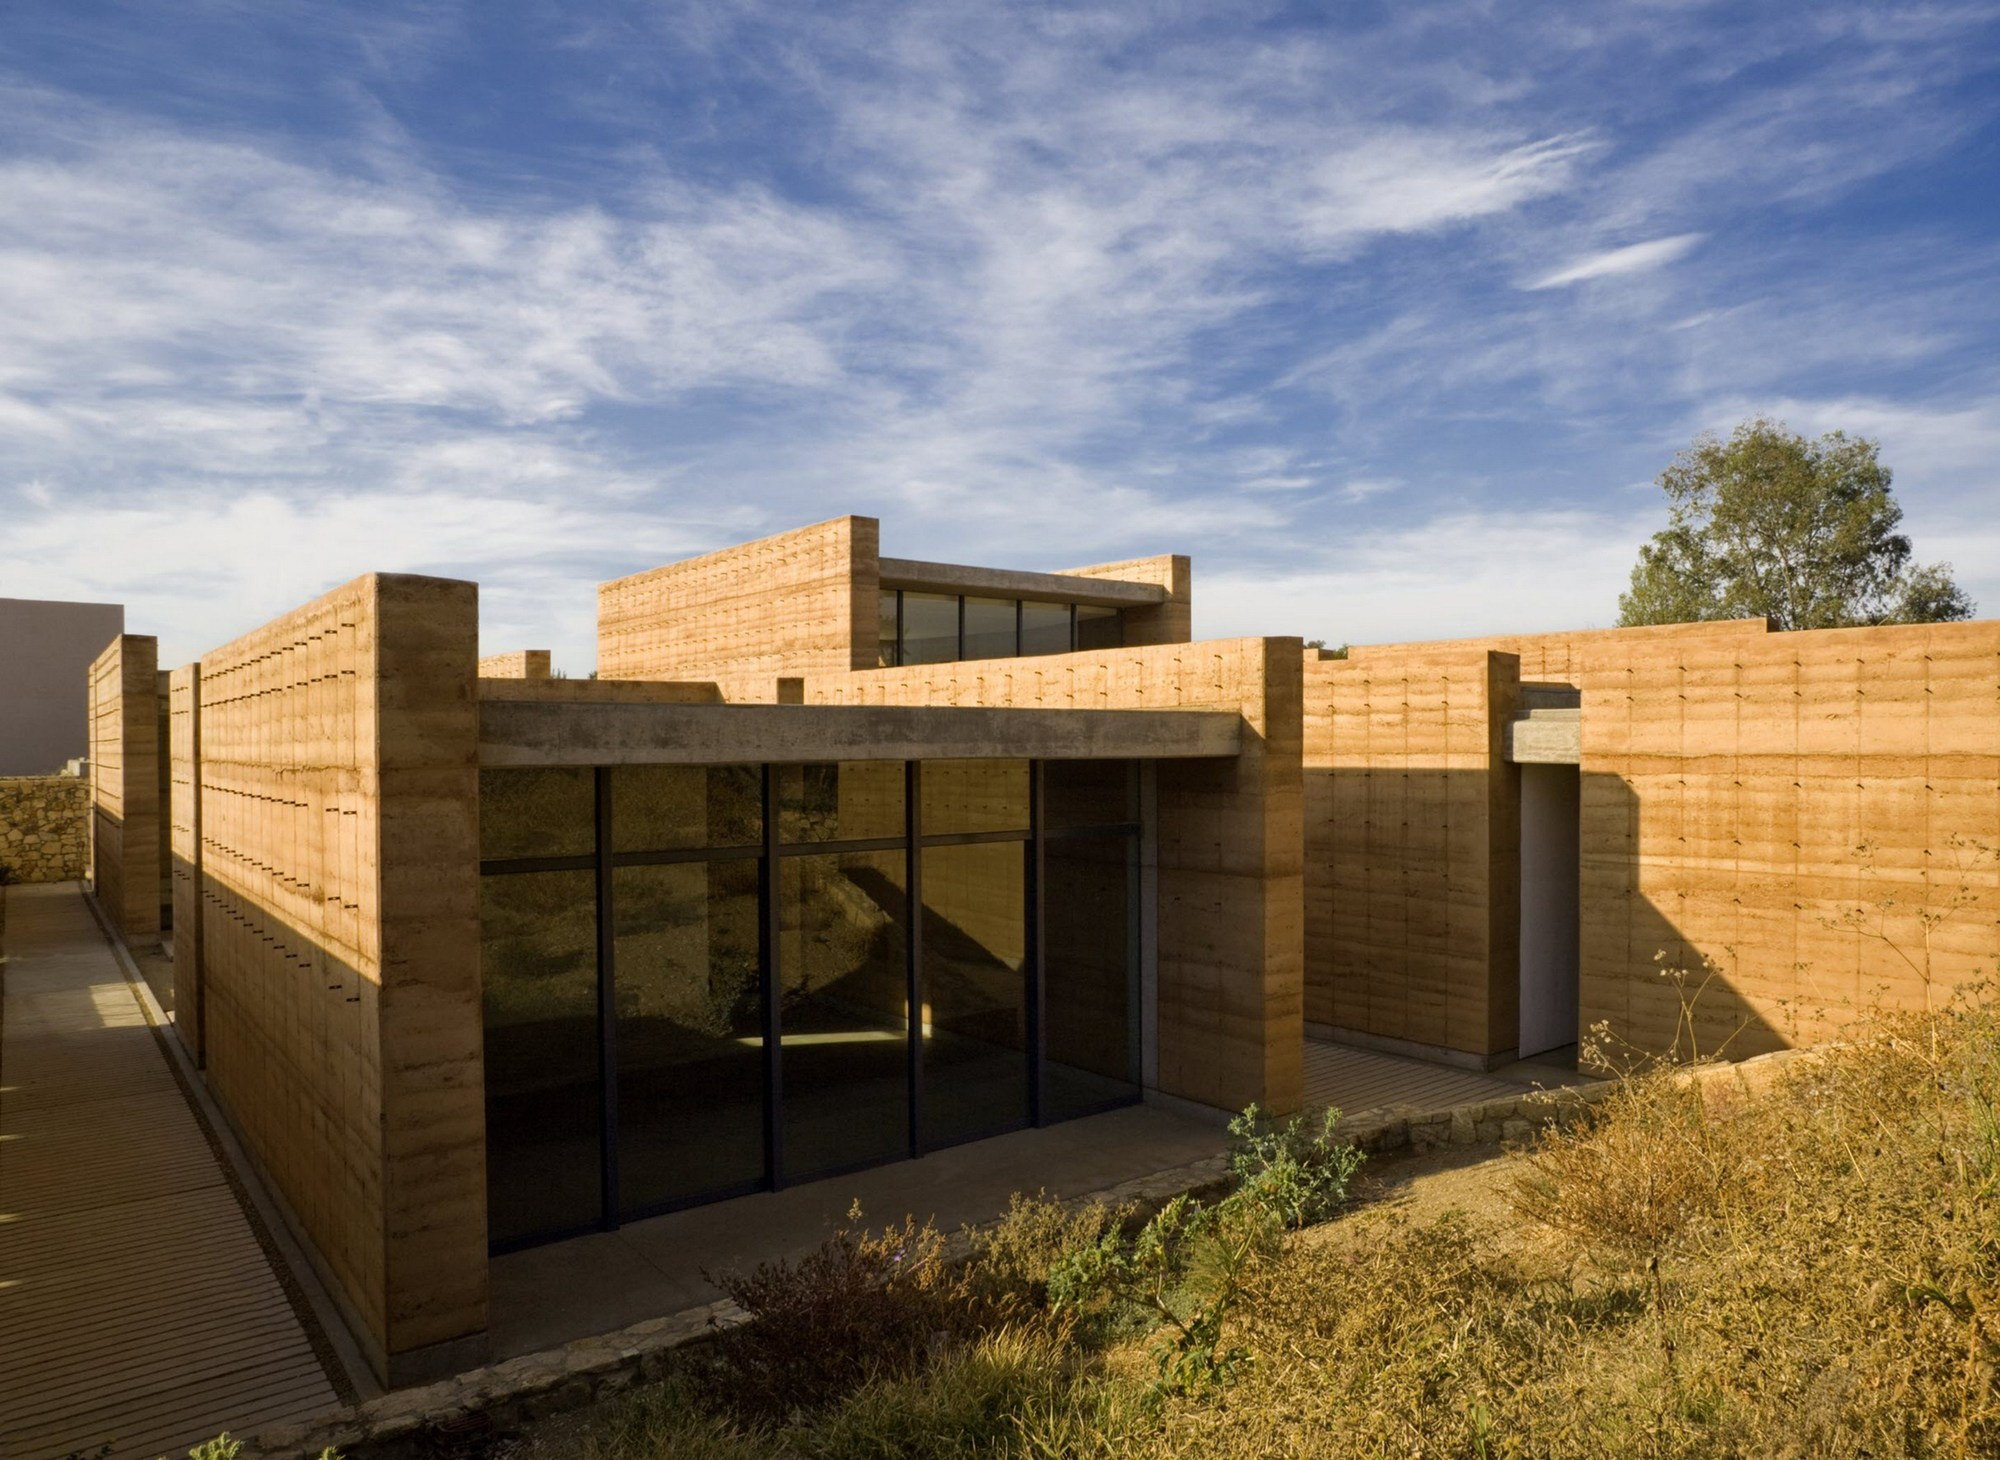 Escuela de artes visuales de oaxaca taller de for Plataforma de arquitectura